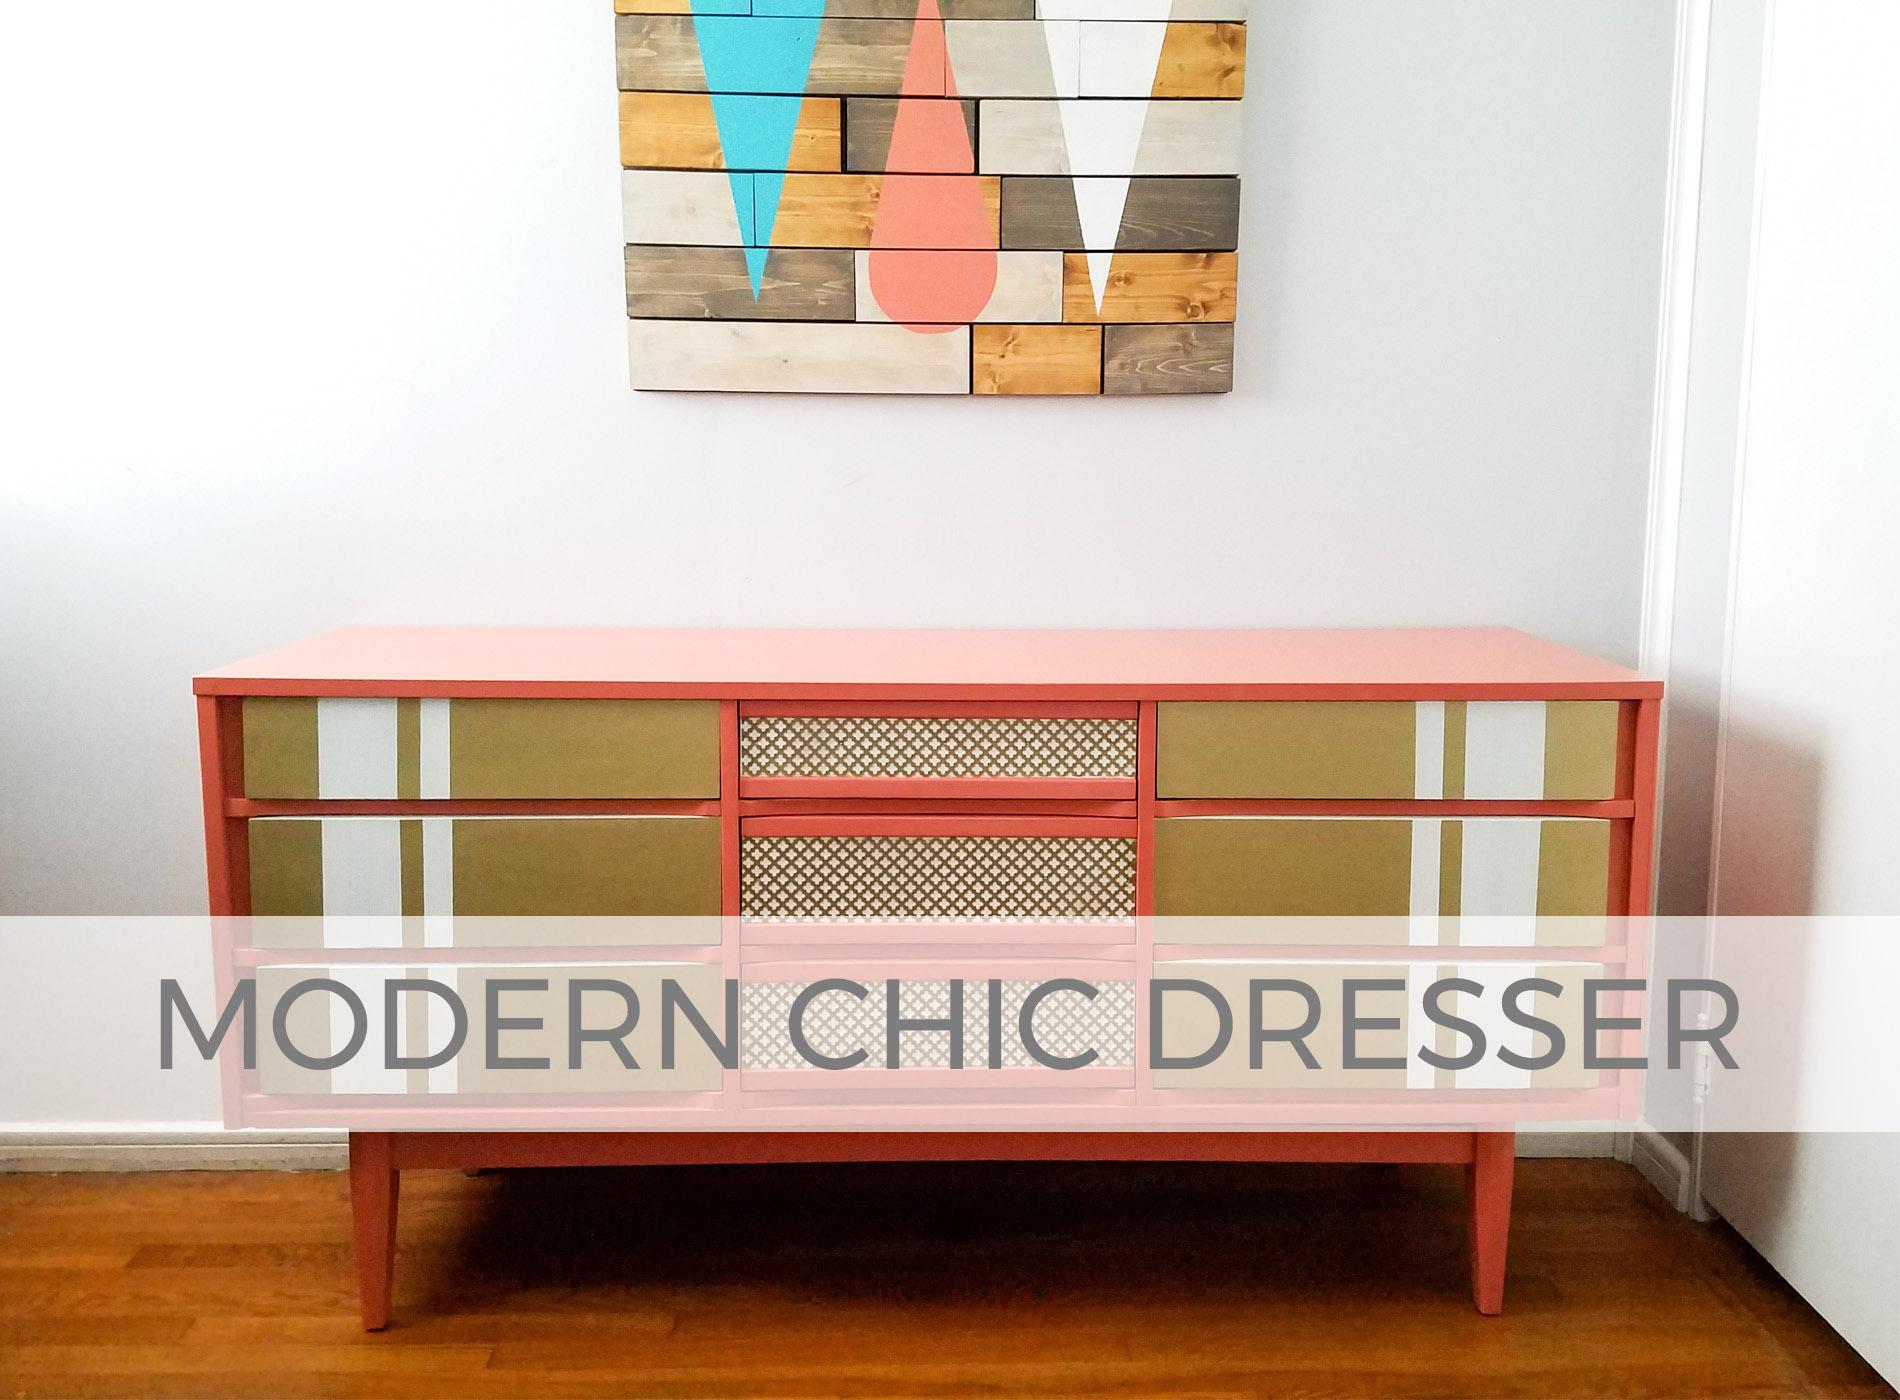 Modern Chic Dresser by Larissa of Prodigal Pieces | prodigalpieces.com